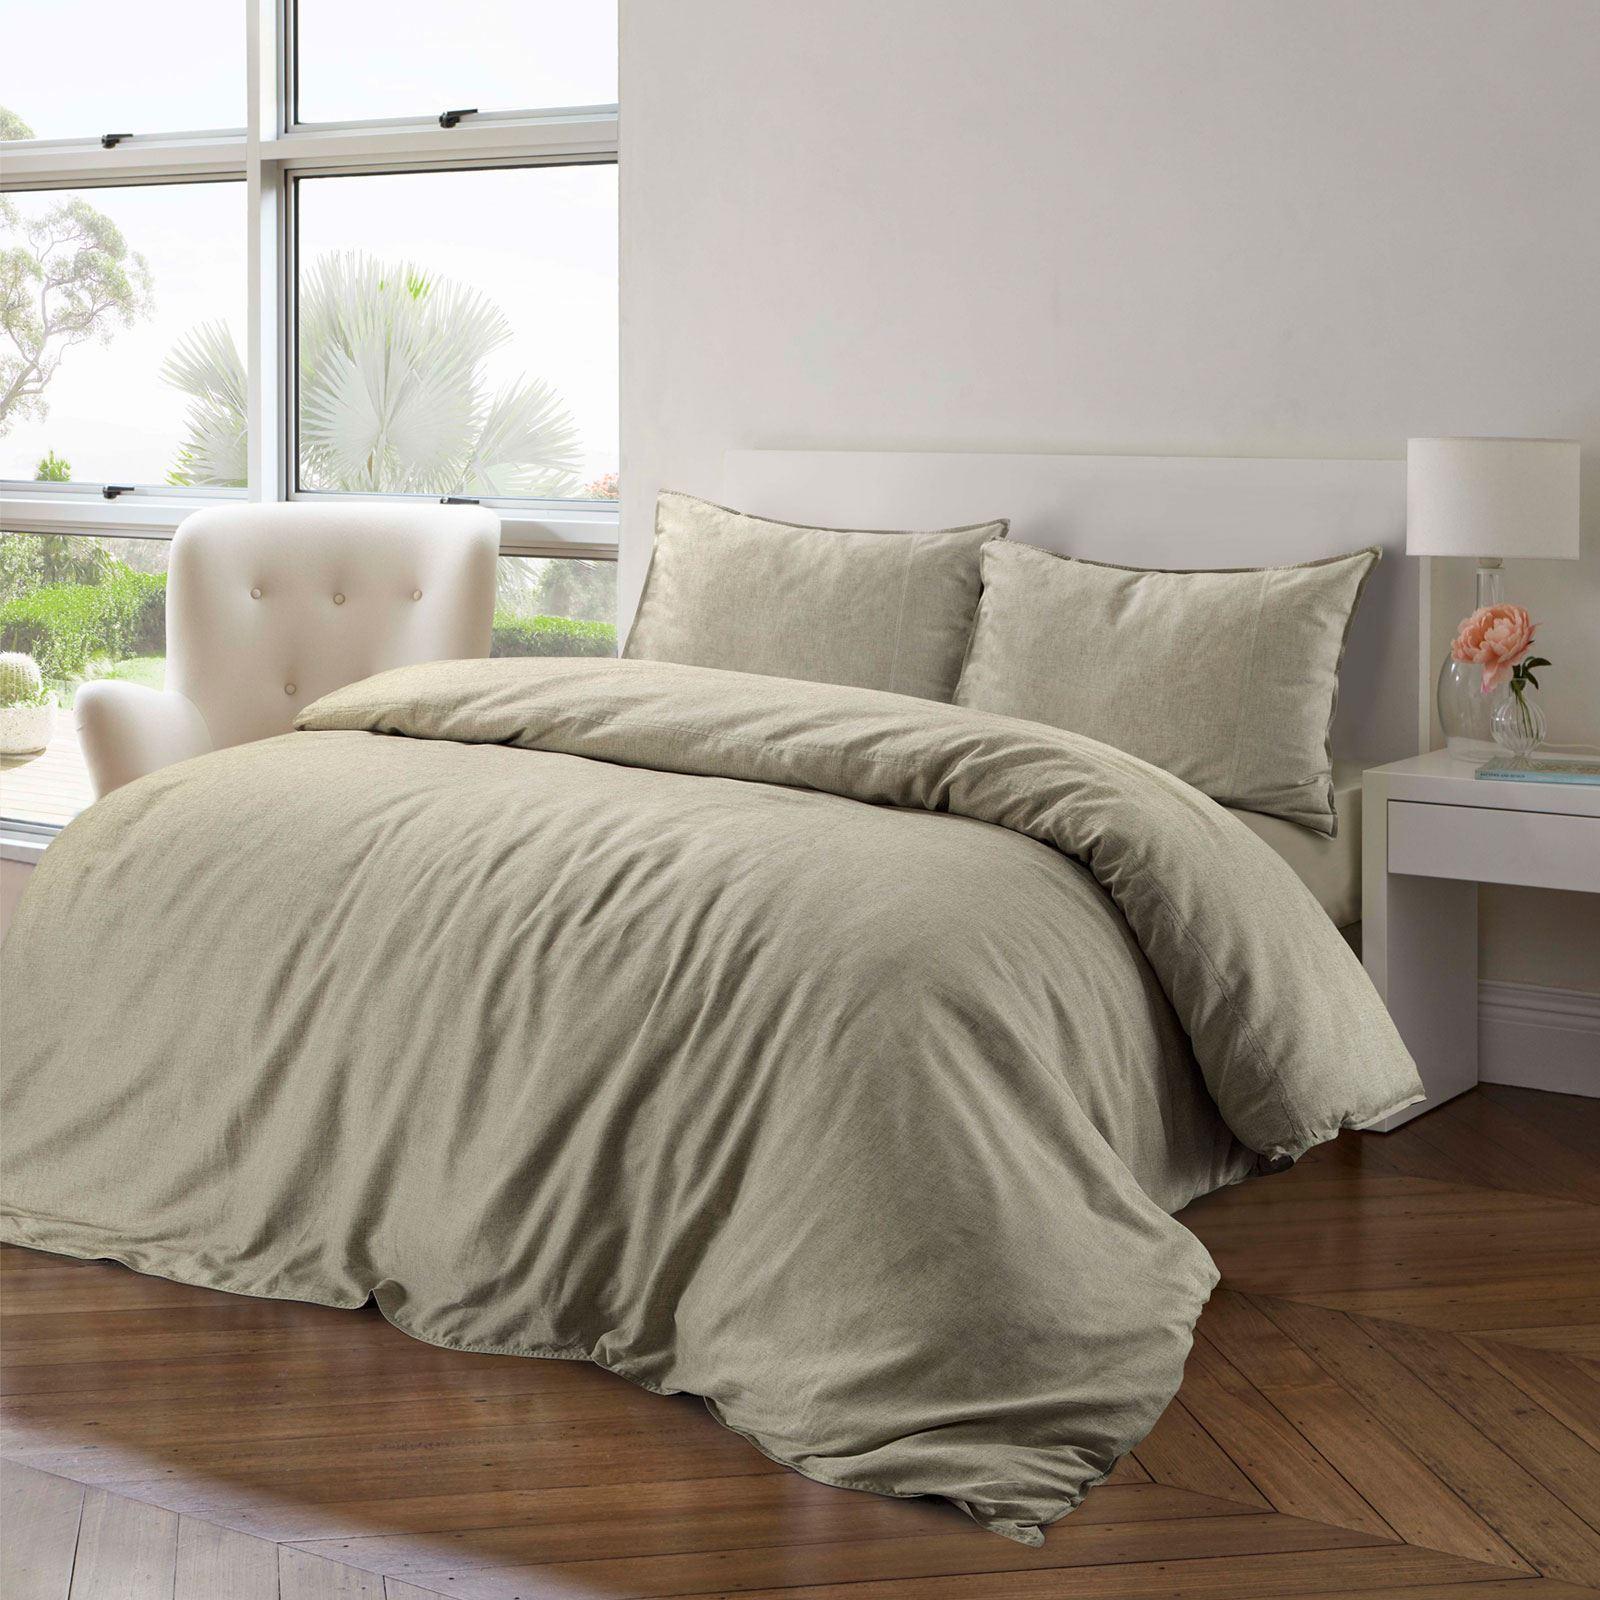 100-Cotton-Linen-Pure-Natural-Duvet-Cover-Bedding-Set-Double-King-Single thumbnail 18